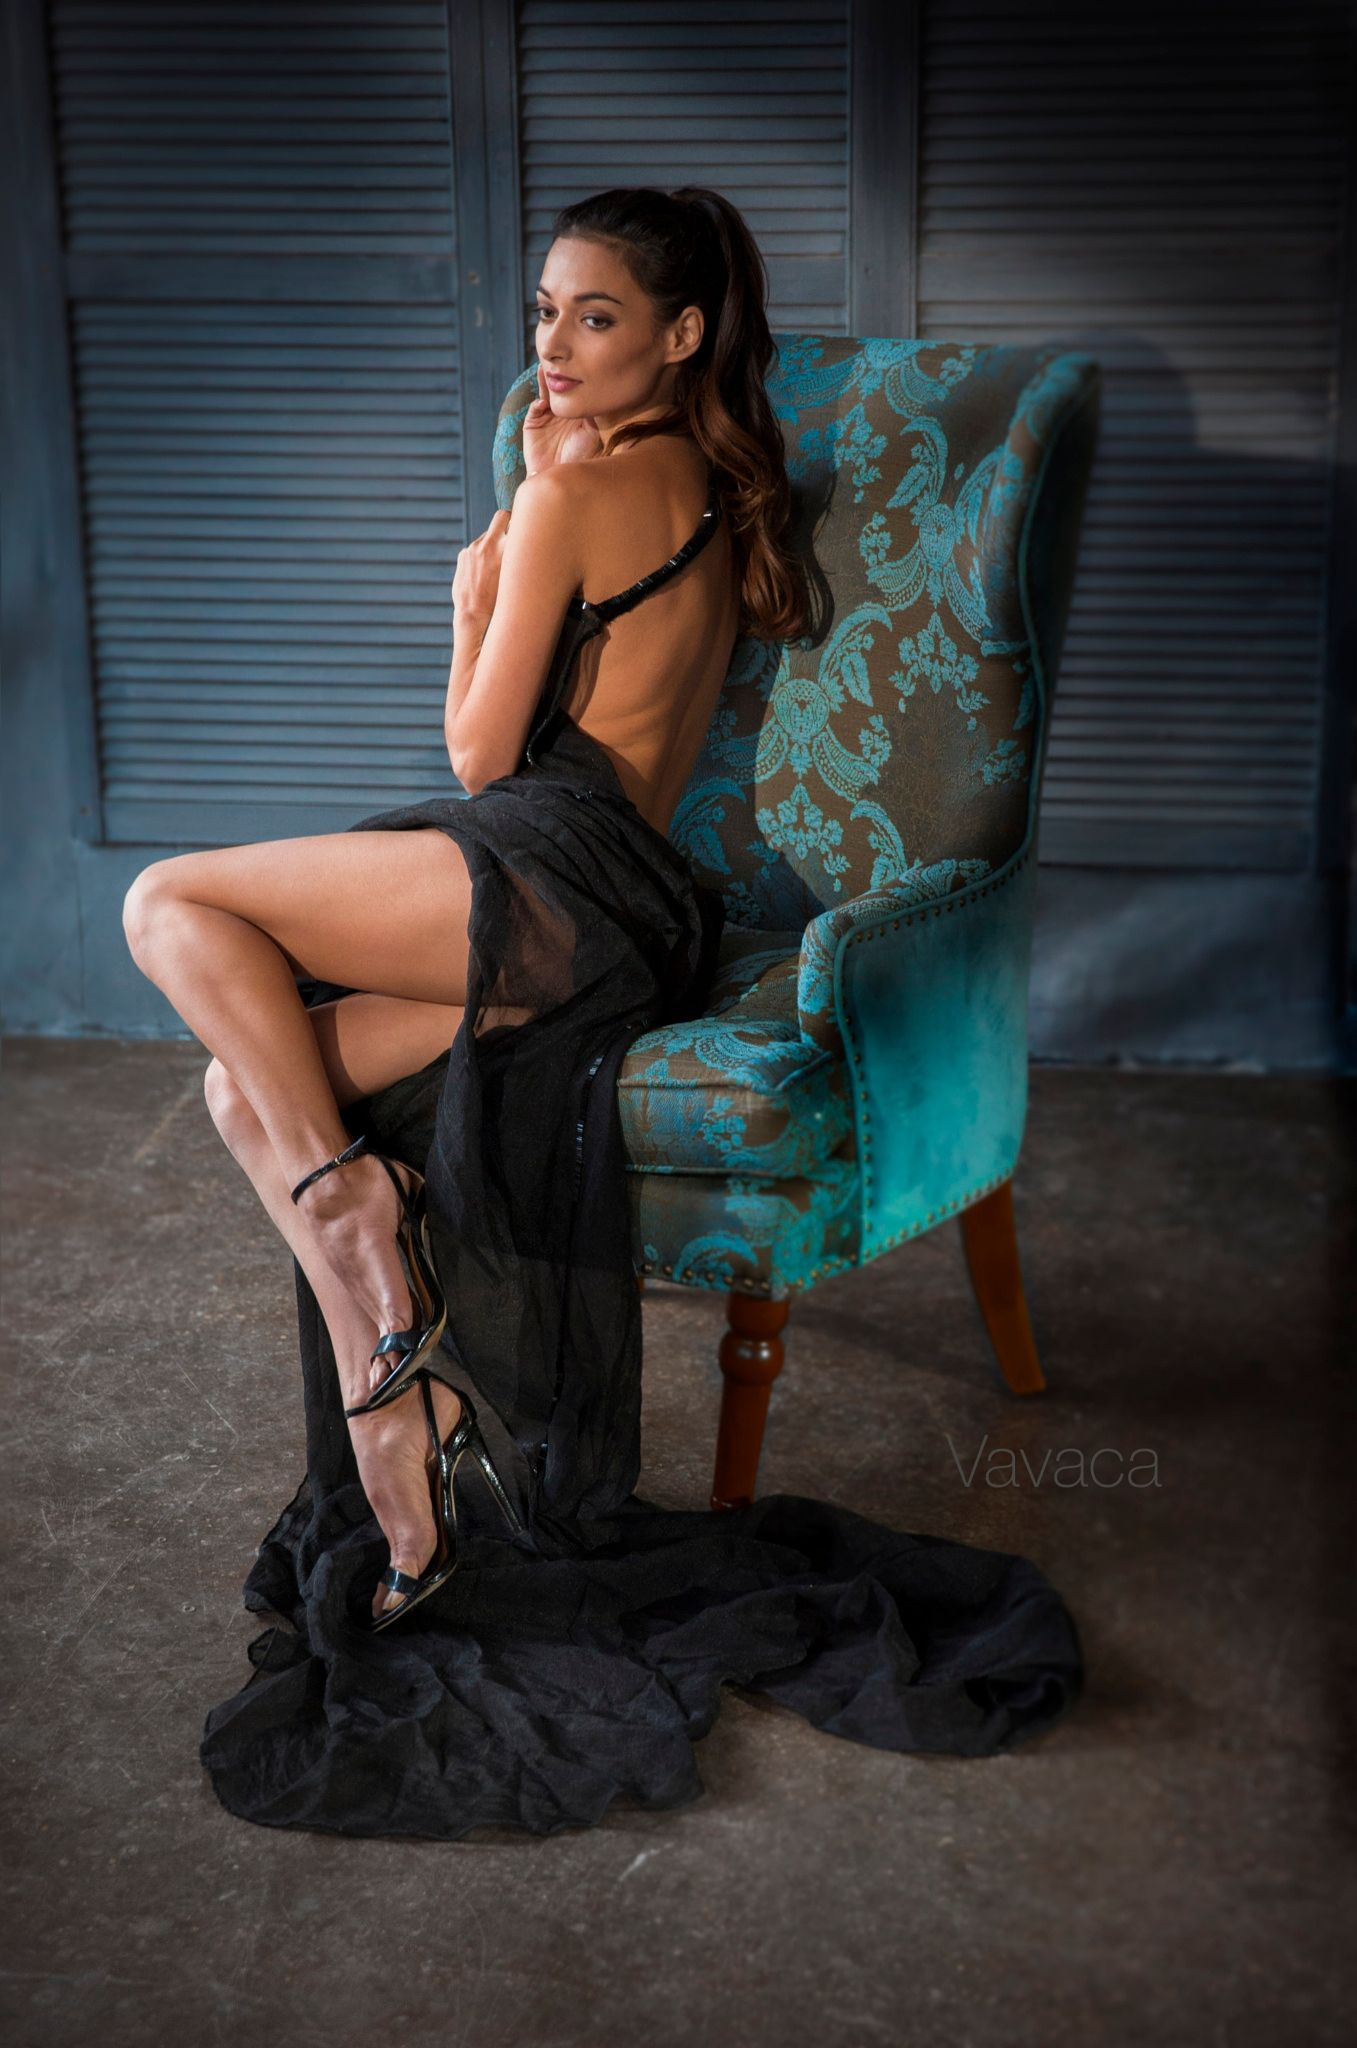 Naya Mamedova nudes (62 gallery), hacked Pussy, Twitter, cameltoe 2016